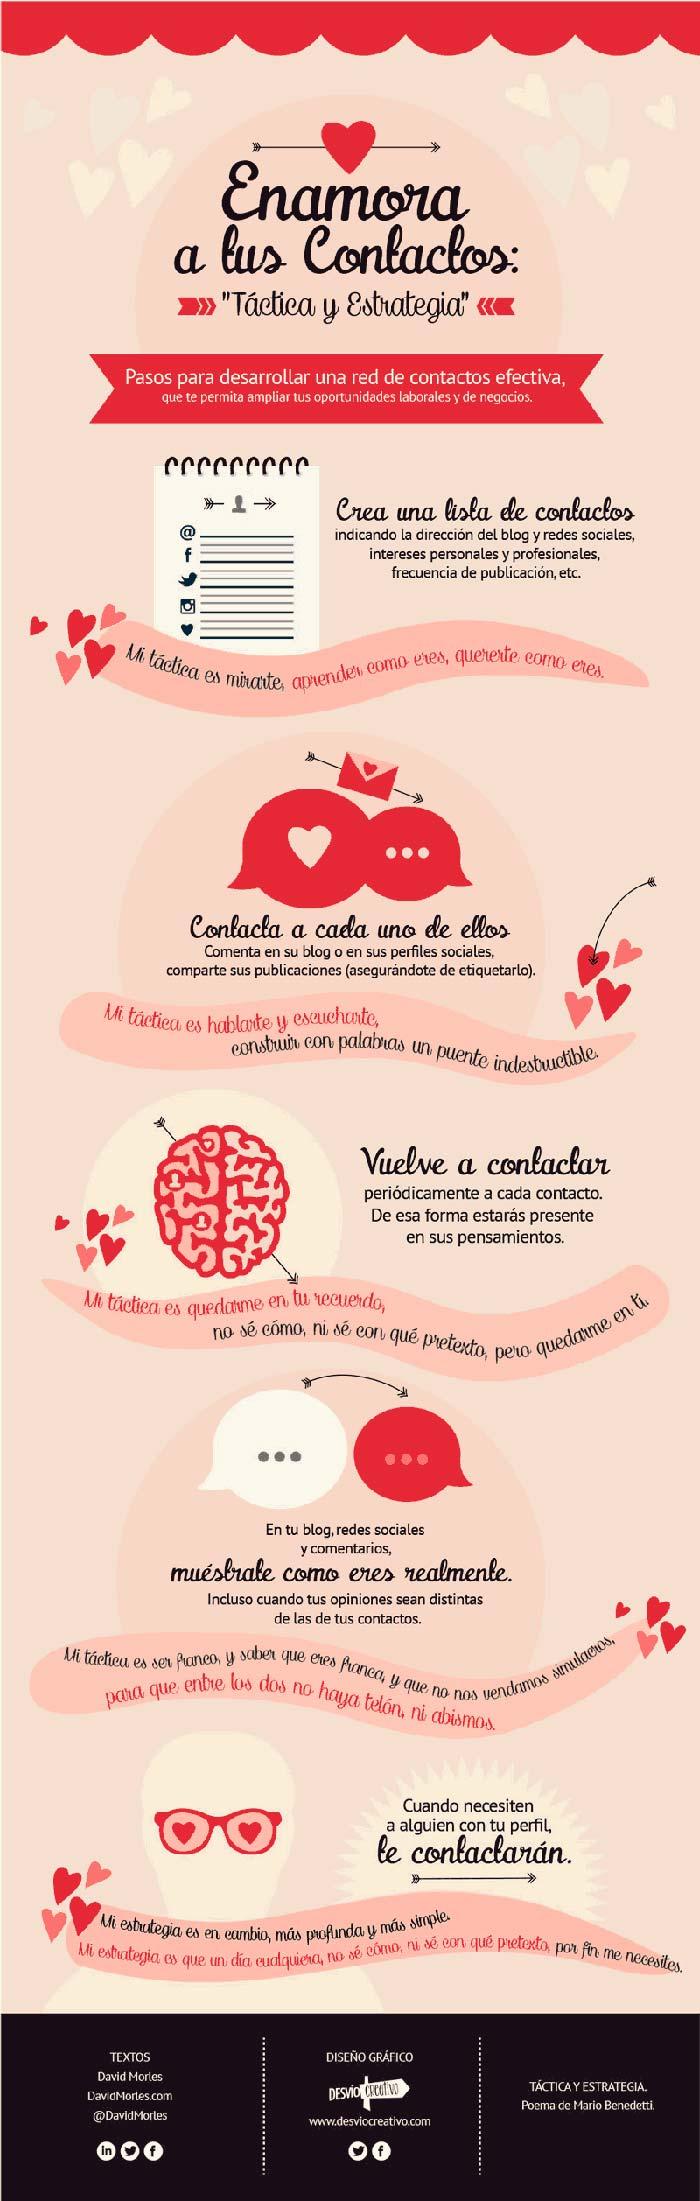 Infografia sobre como enamorar a vuestros contactos